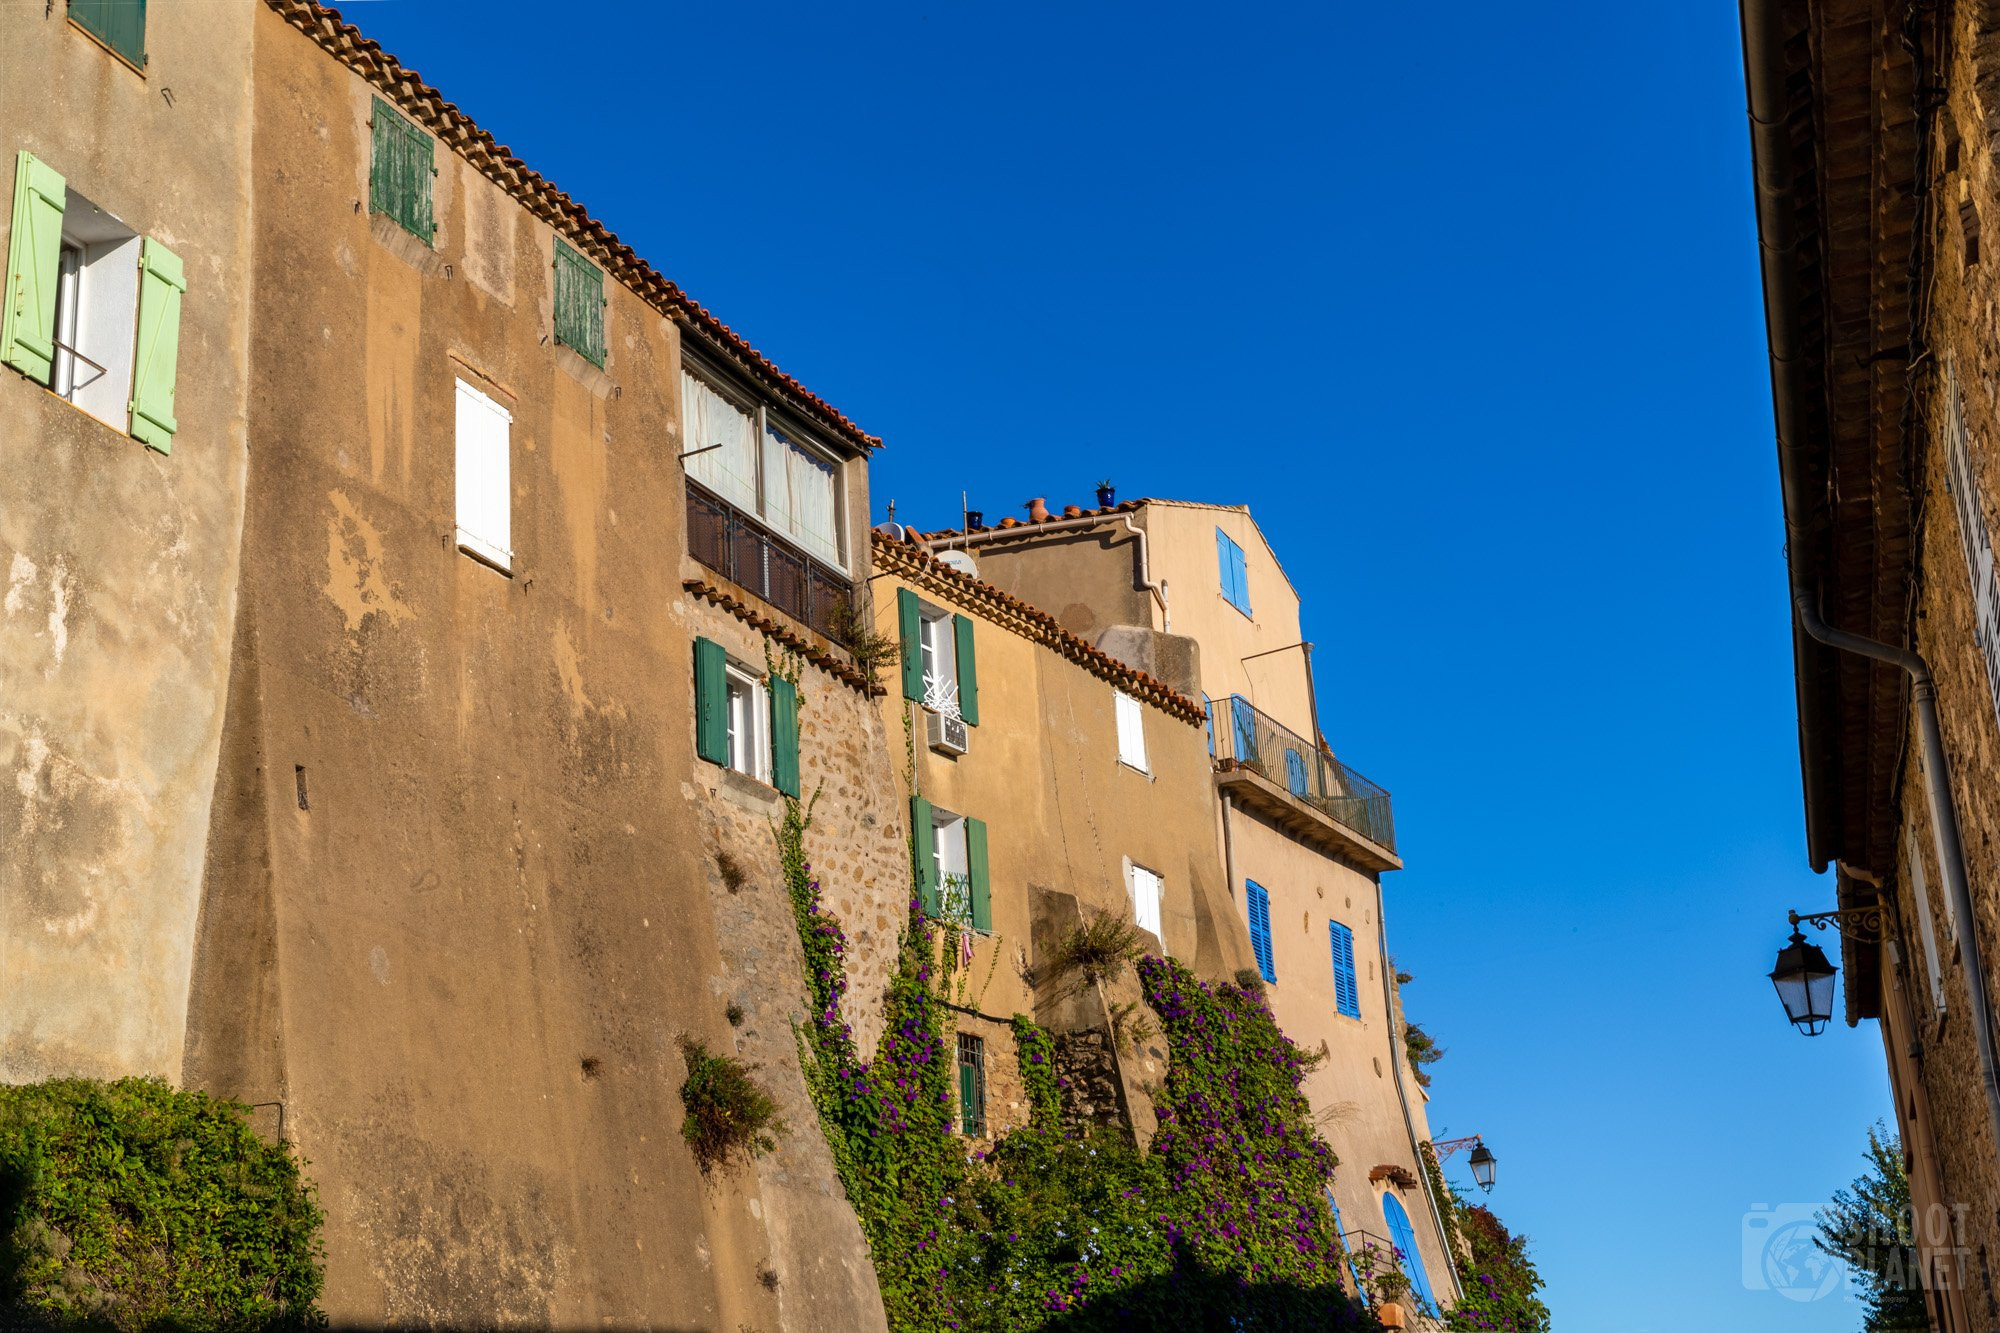 Ramatuelle village, near Saint Tropez, France